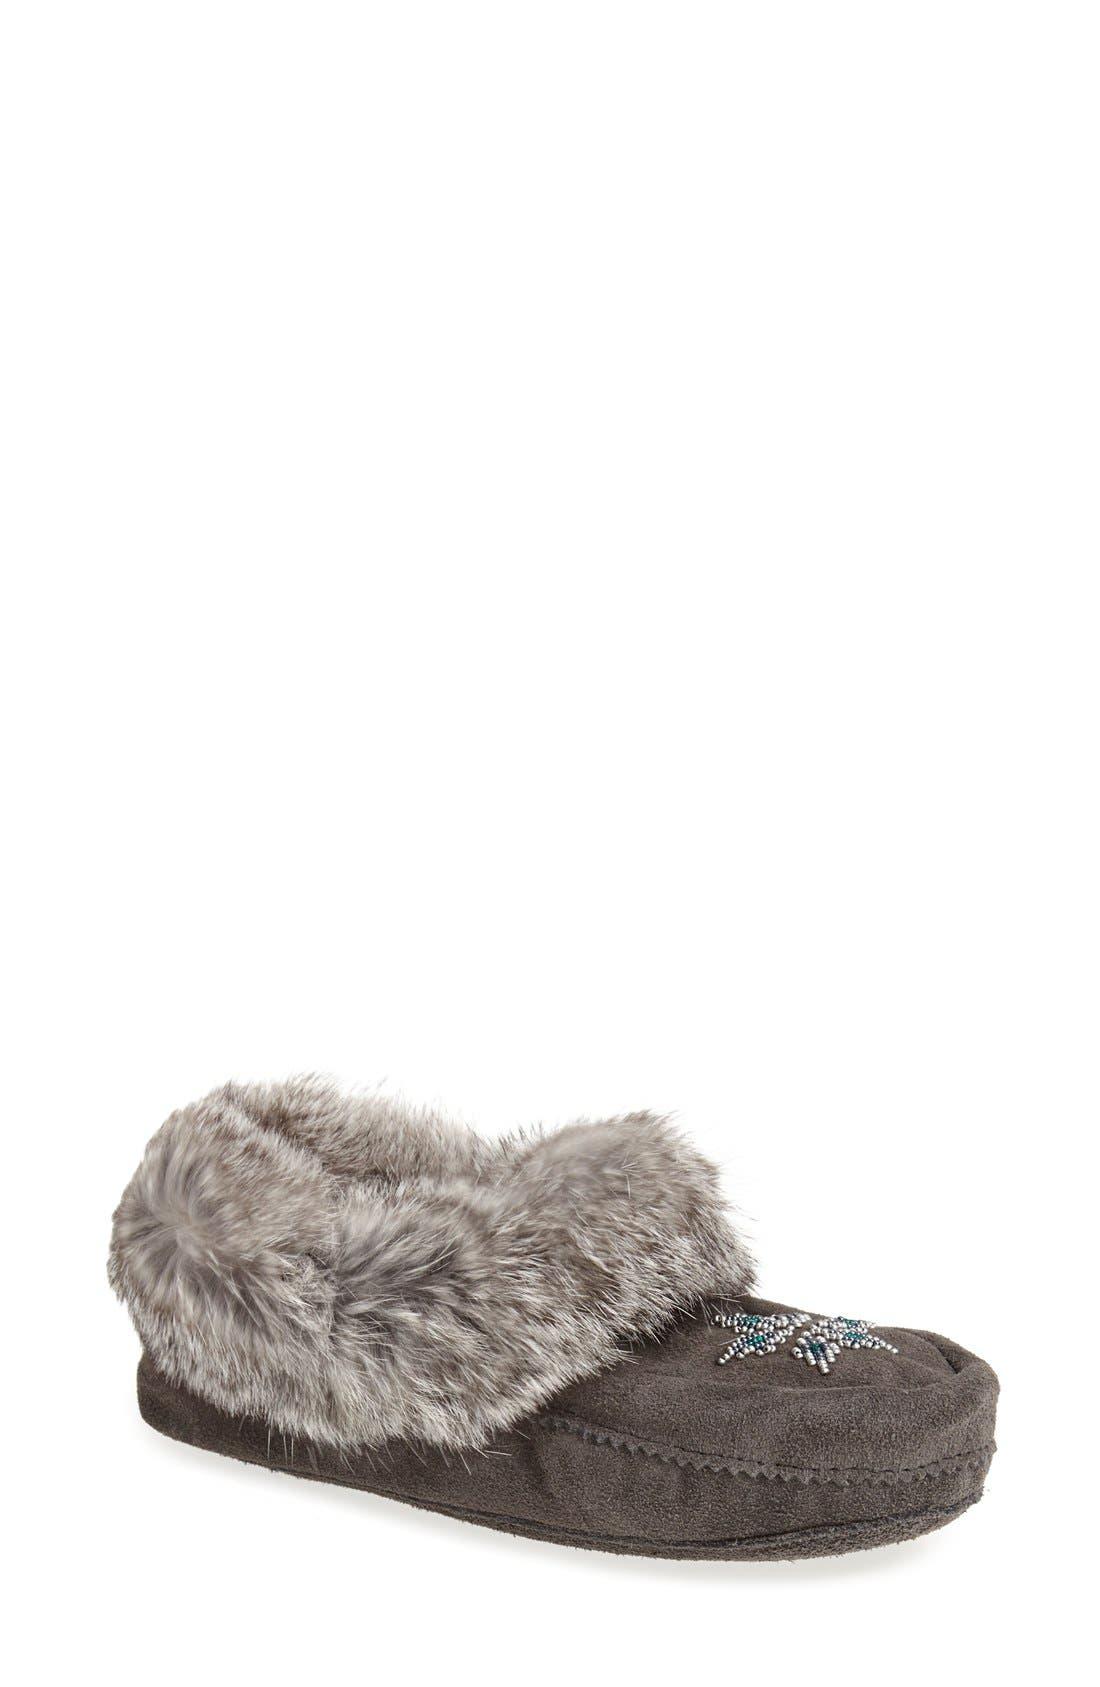 Manitobah Mukluks 'Kanada' Genuine Rabbit Fur & Suede Moccasin Slipper (Women)